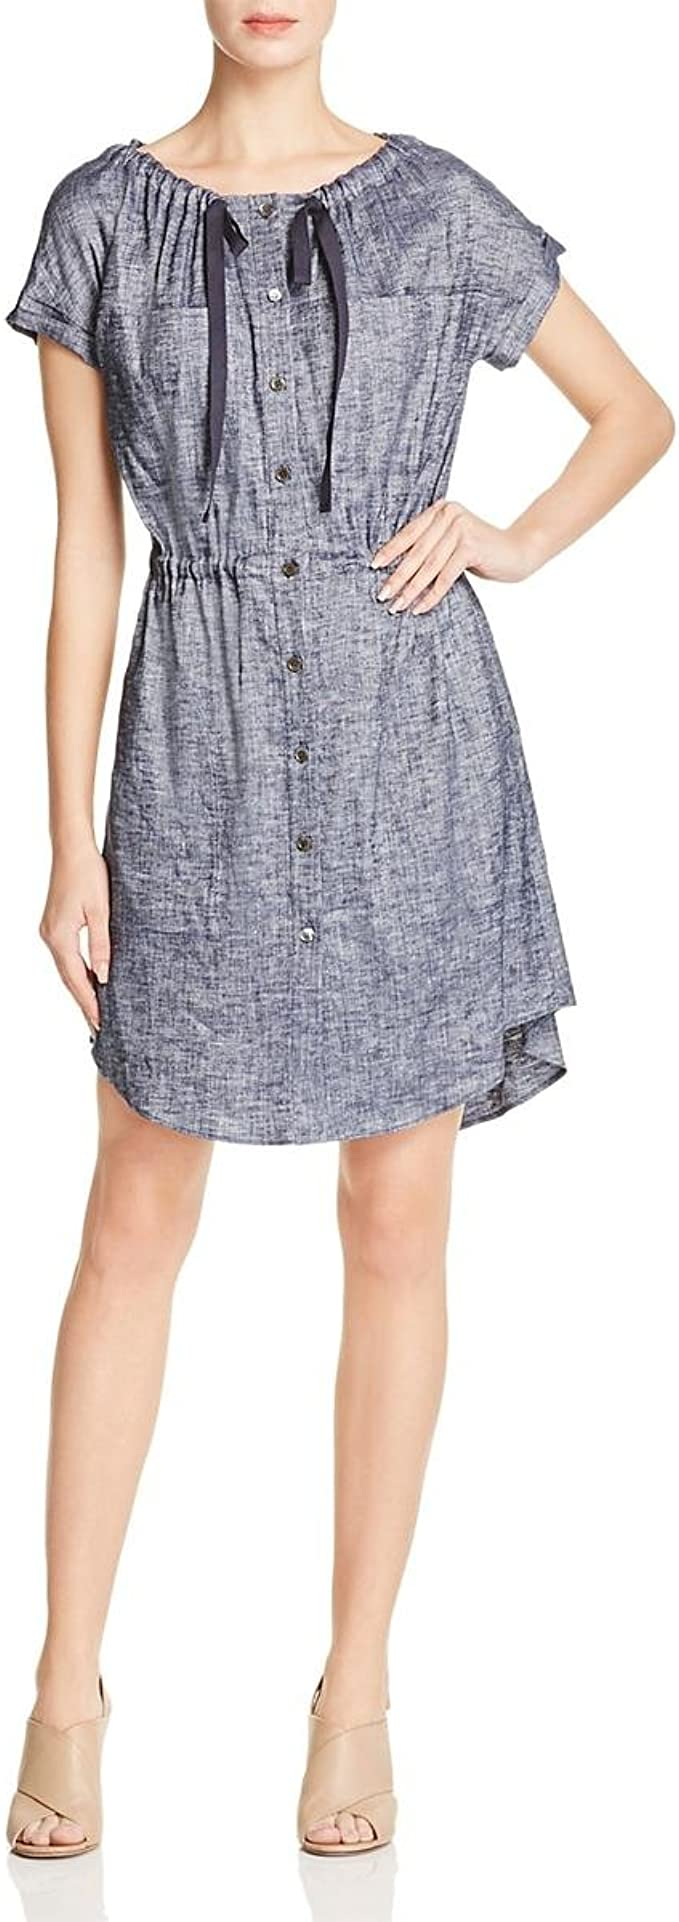 Theory 希尔瑞 Laela Tierra 亚麻连衣裙 10码1.7折$60.19 海淘转运到手约¥447